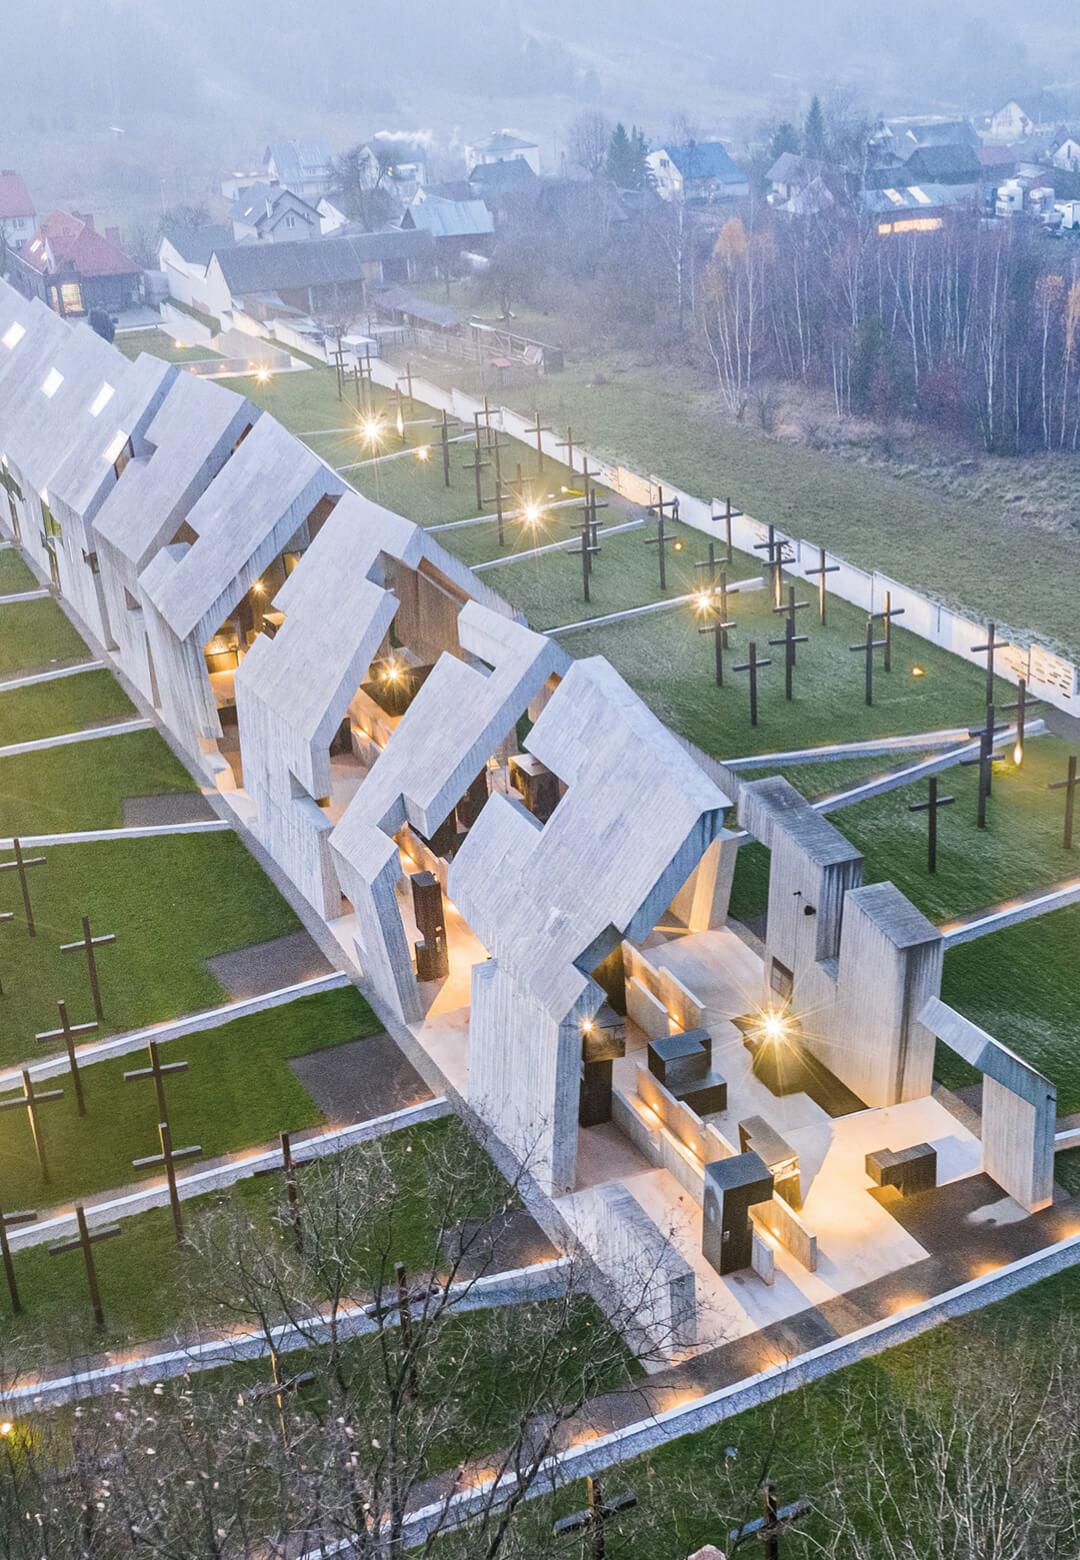 Mausoleum of the Martyrdom of Polish Villages in Michniów, Poland, by Nizio Design International | Mausoleum of the Martyrdom of Polish Villages in Michniów by Nizio Design International | STIRworld